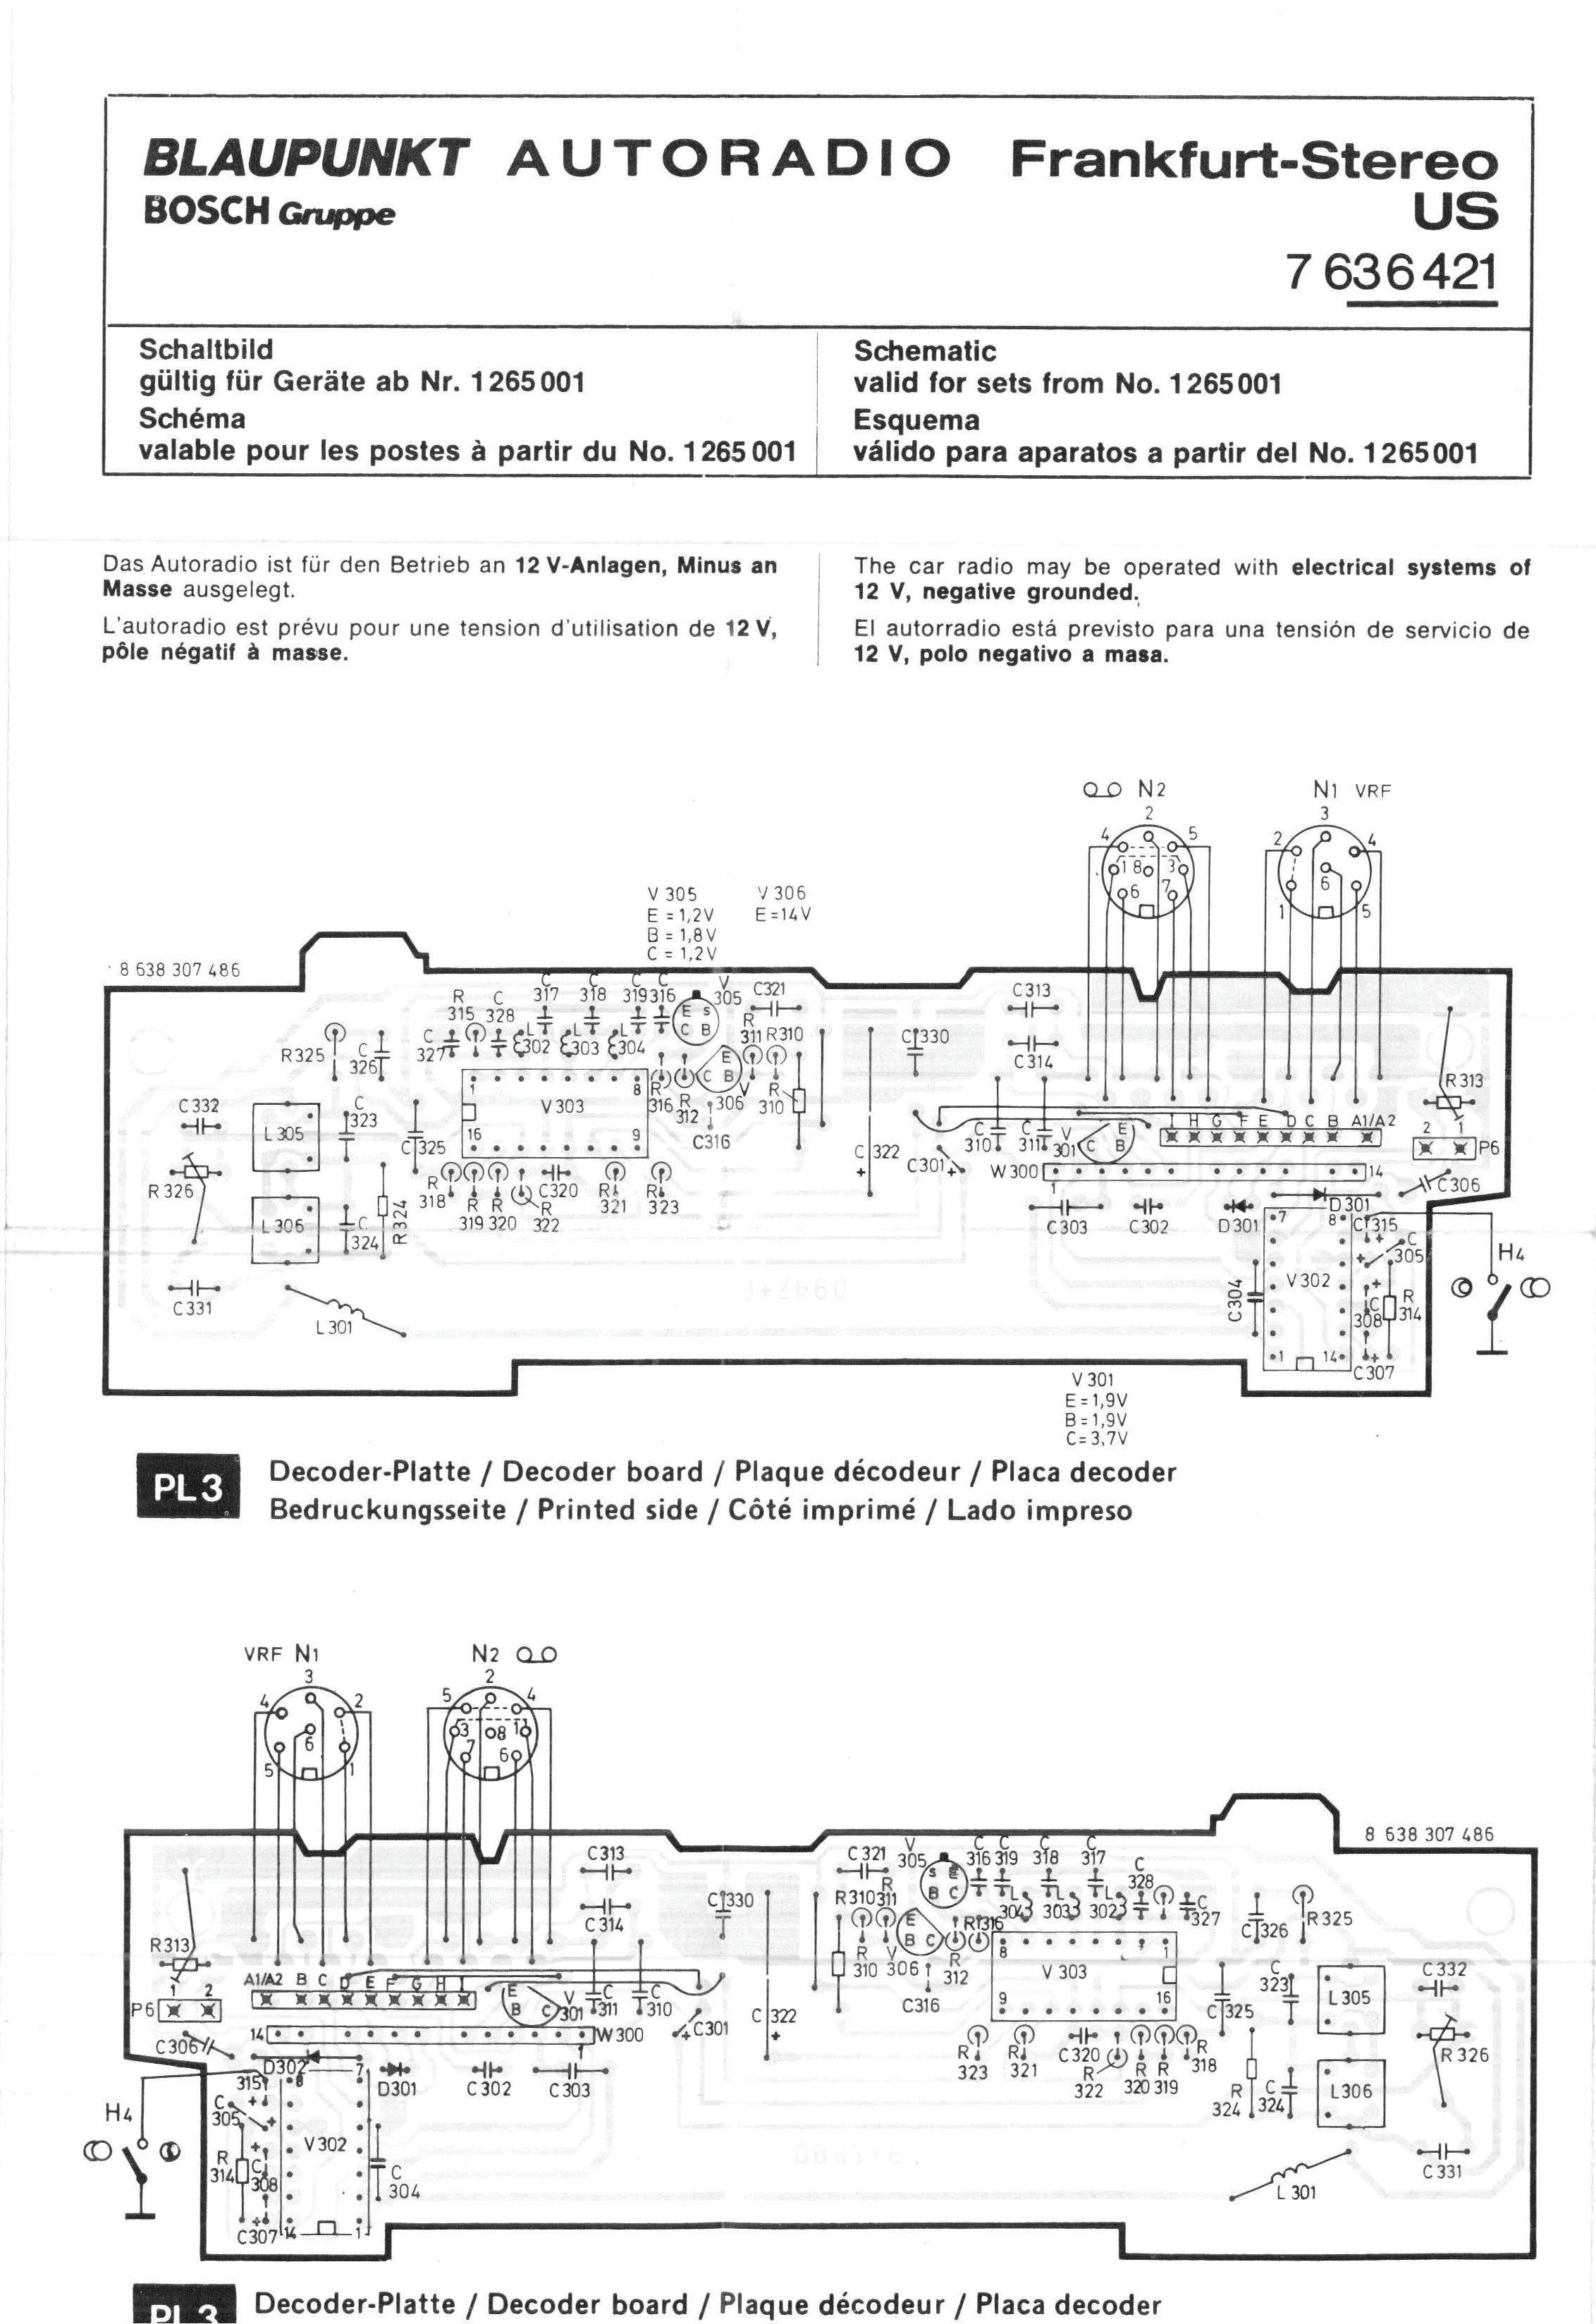 Blaupunkt Radio Wiring Harness : Blaupunkt frankfurt radio wiring panasonic